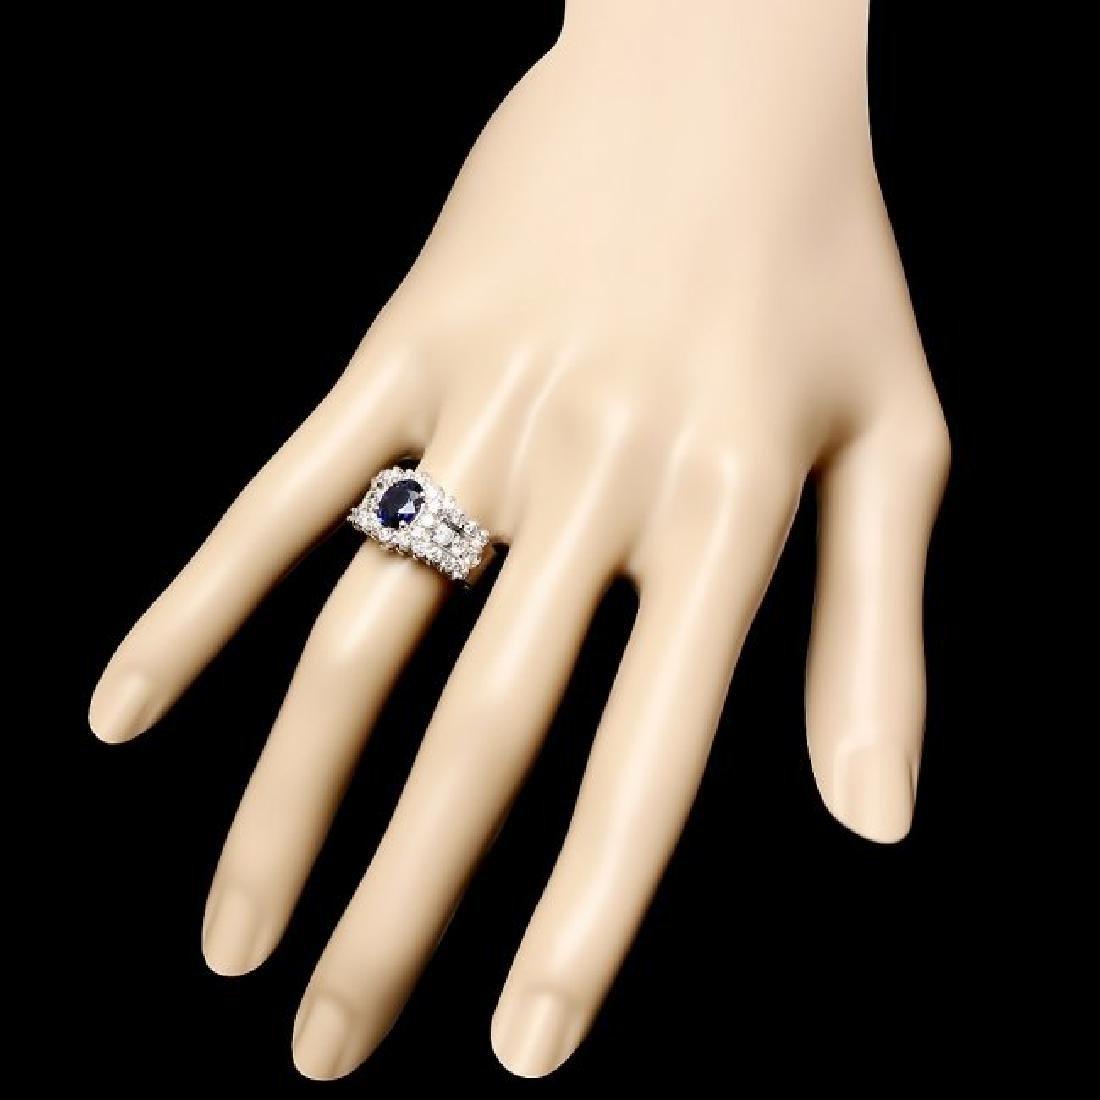 14k Gold 1.00ct Sapphire 1.55ct Diamond Ring - 3